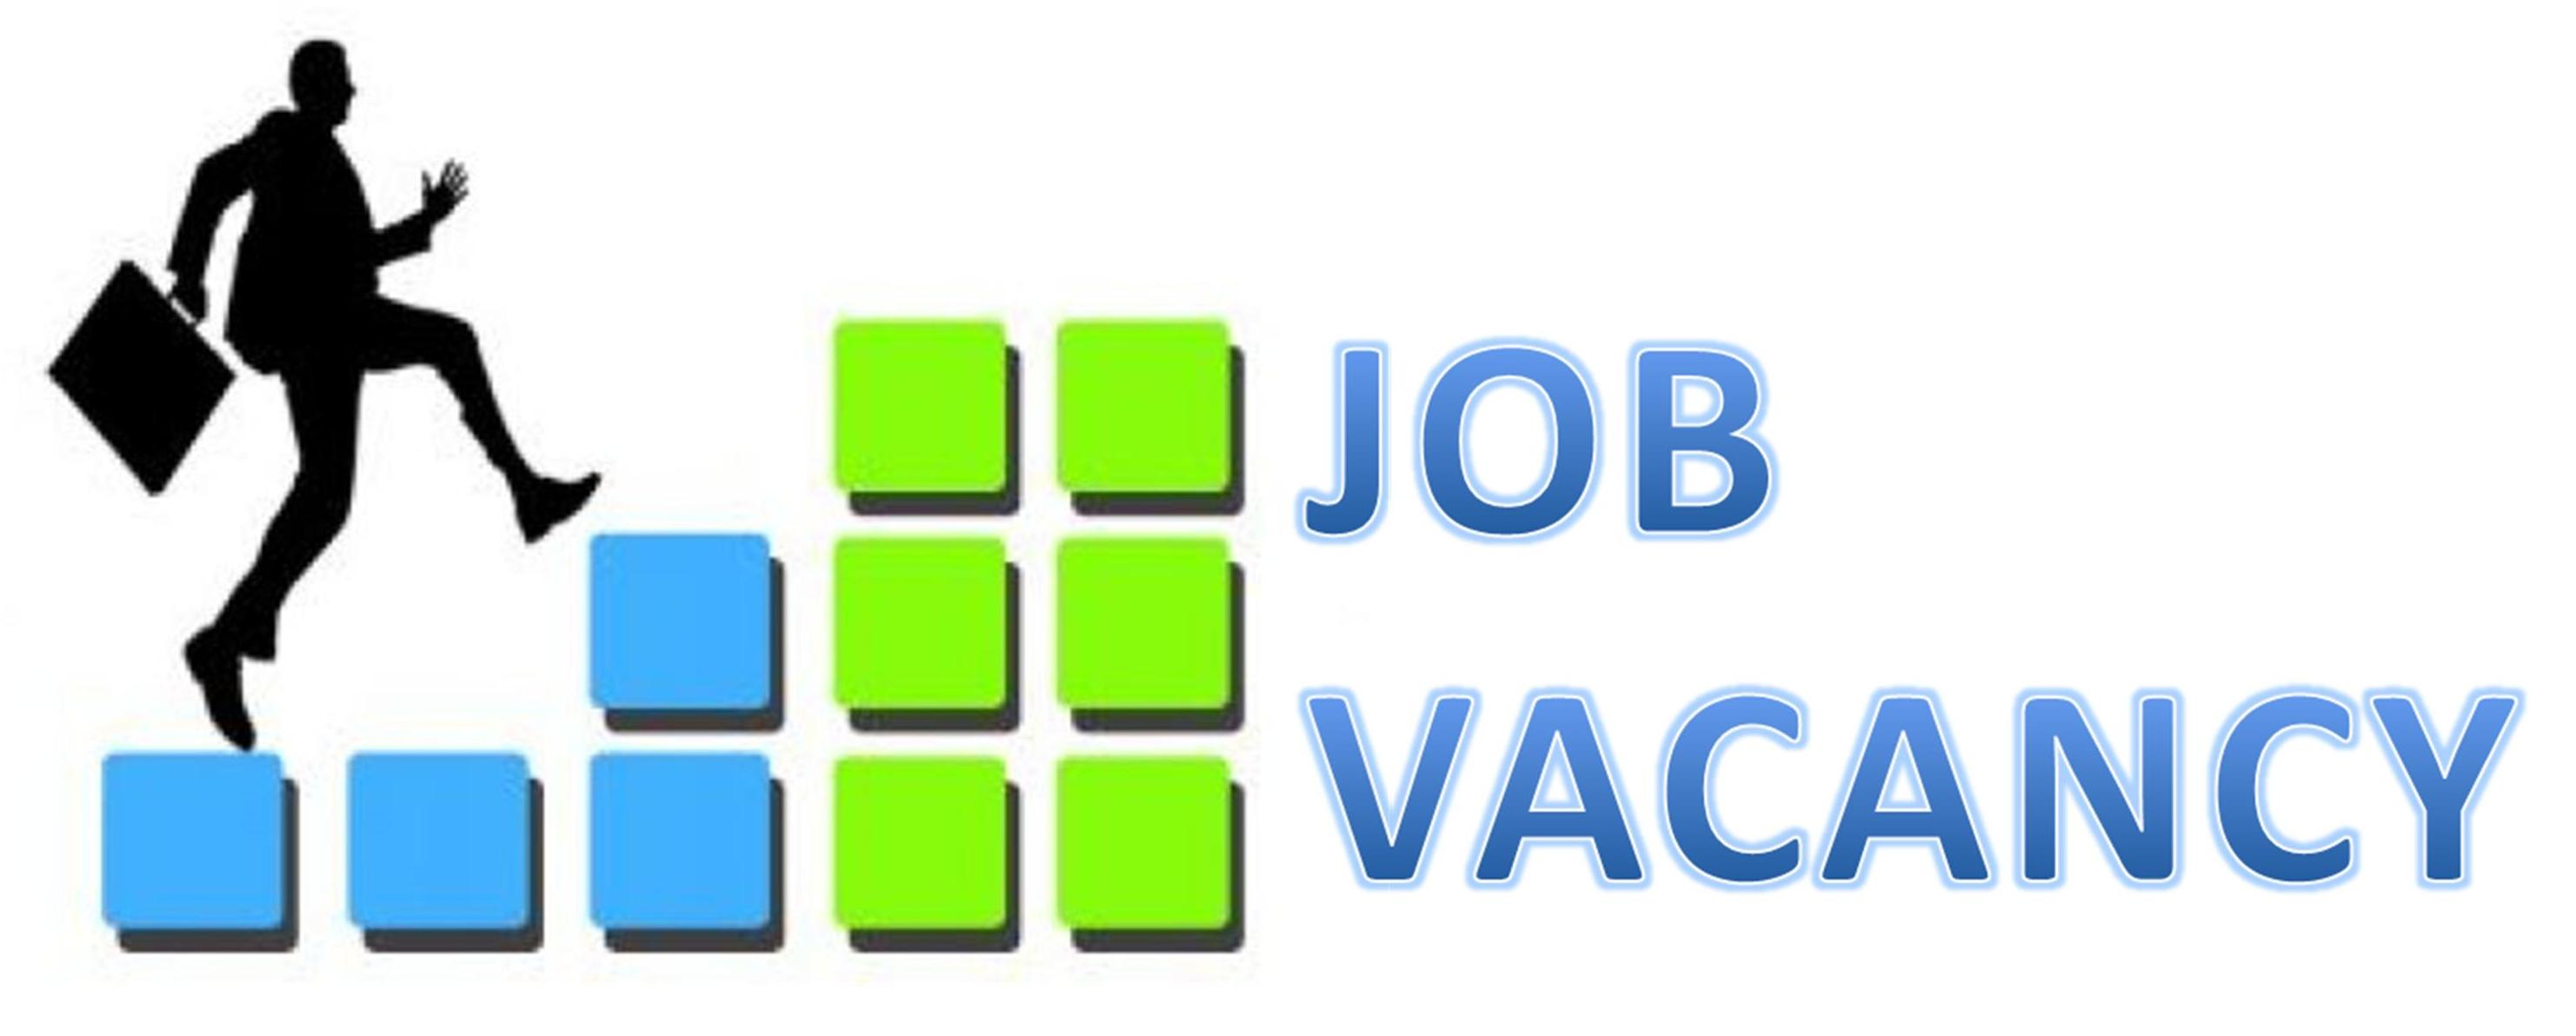 most current document controller vacancies